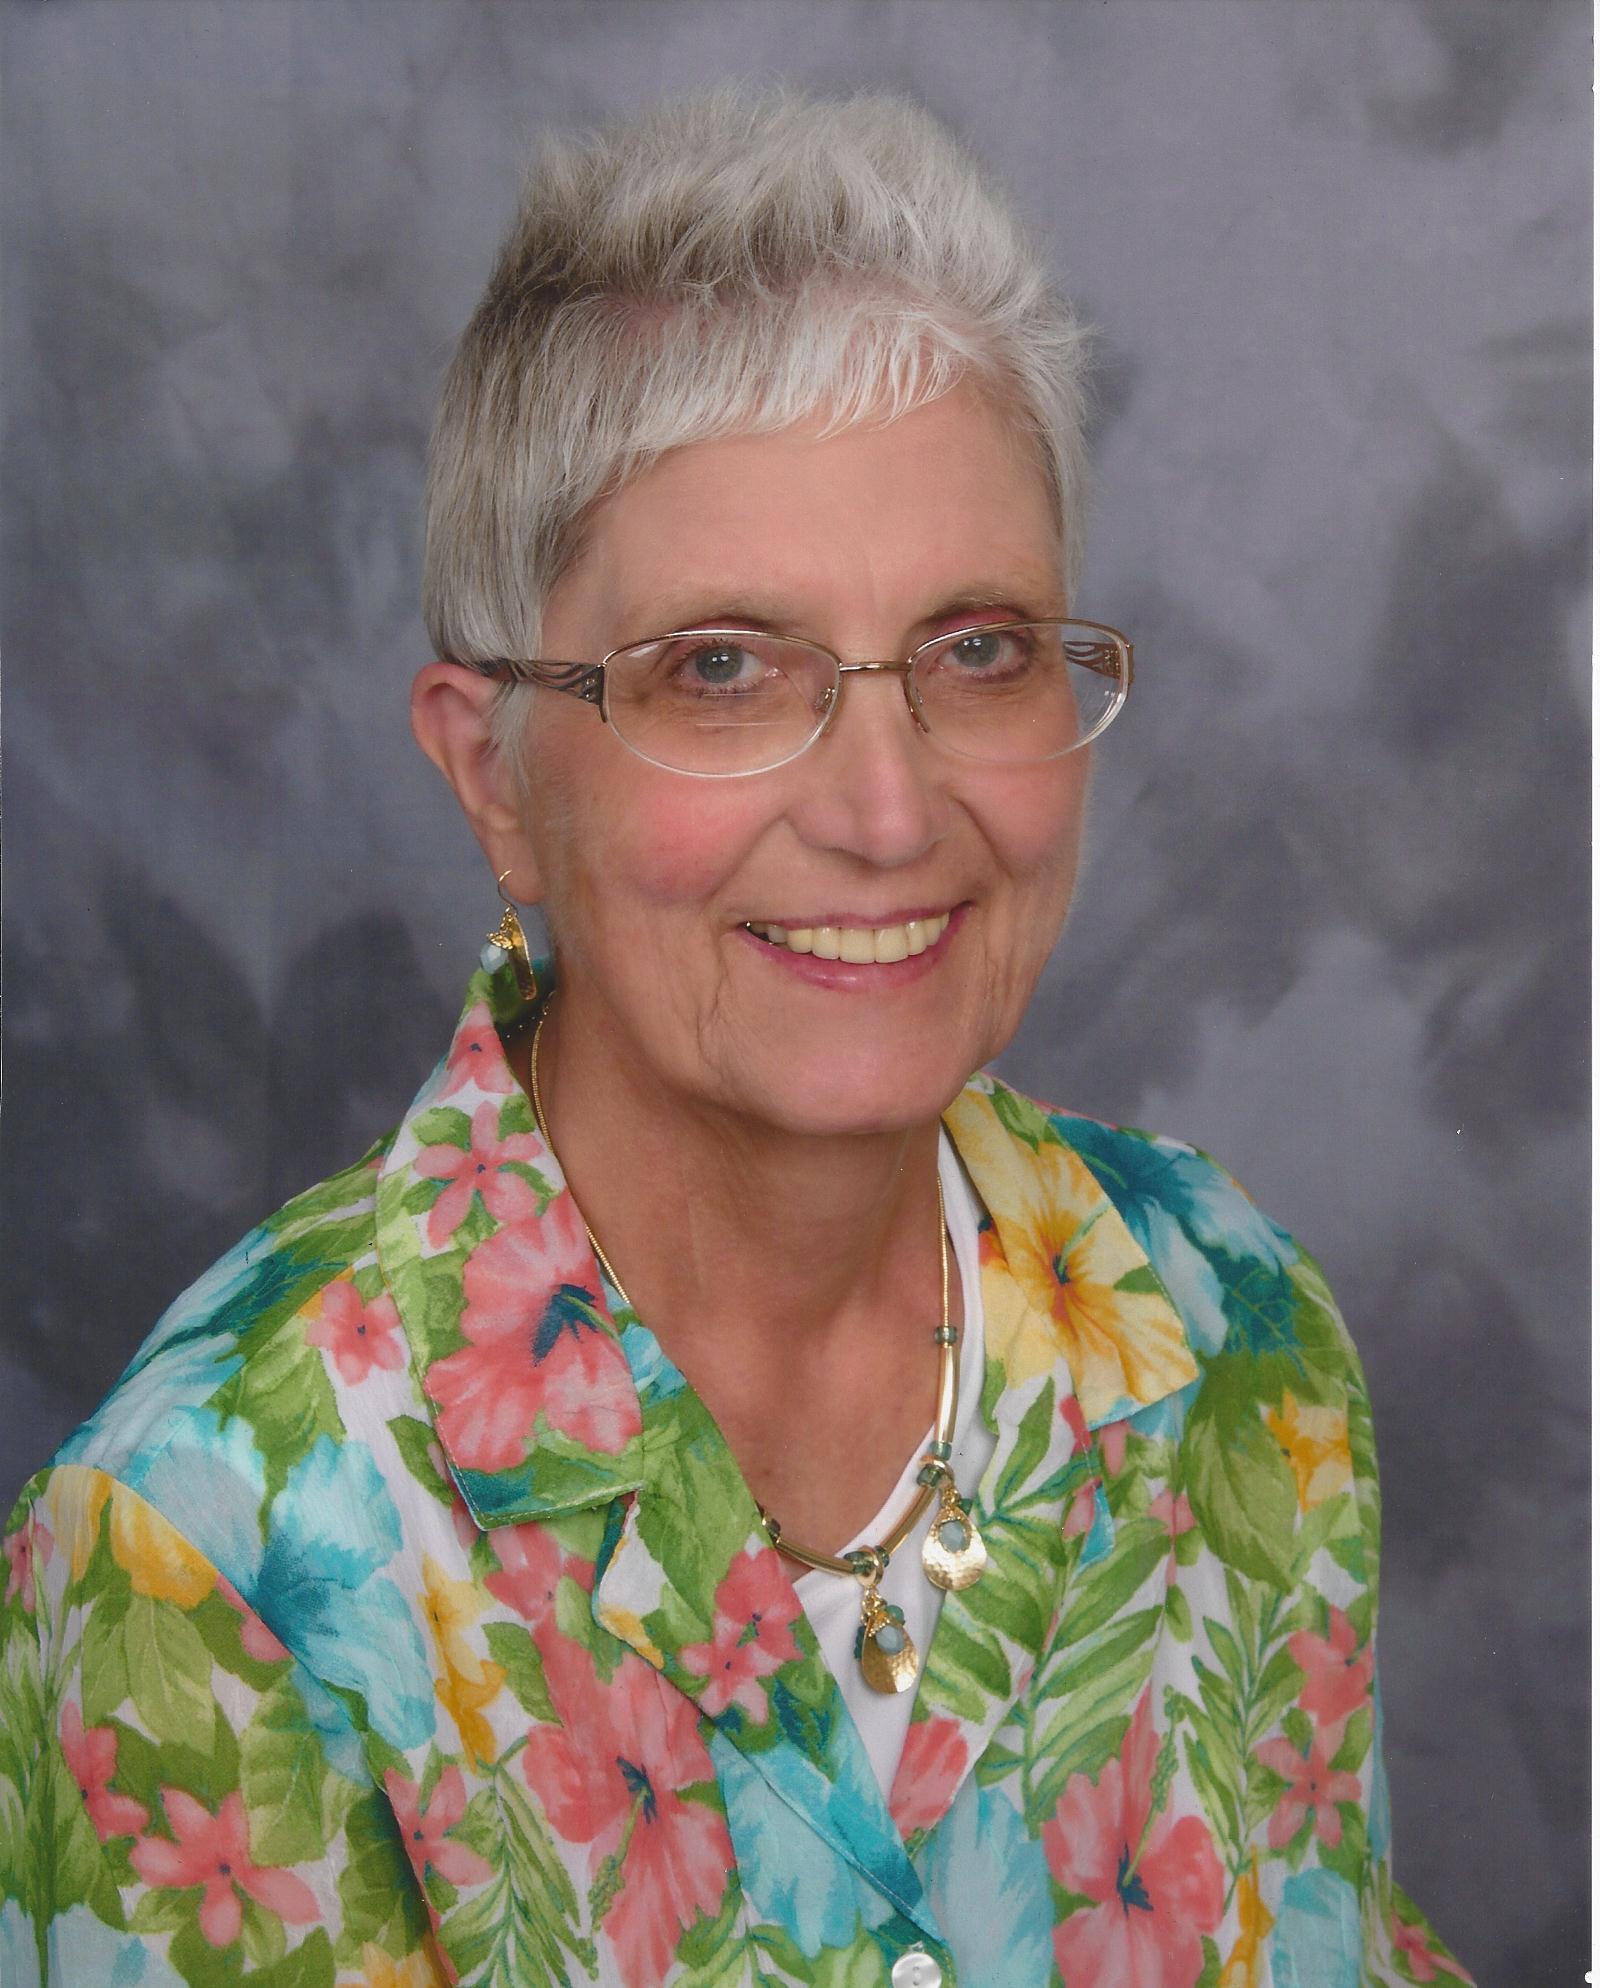 Obit: Sharon Marsha Young, 66, of Ludington